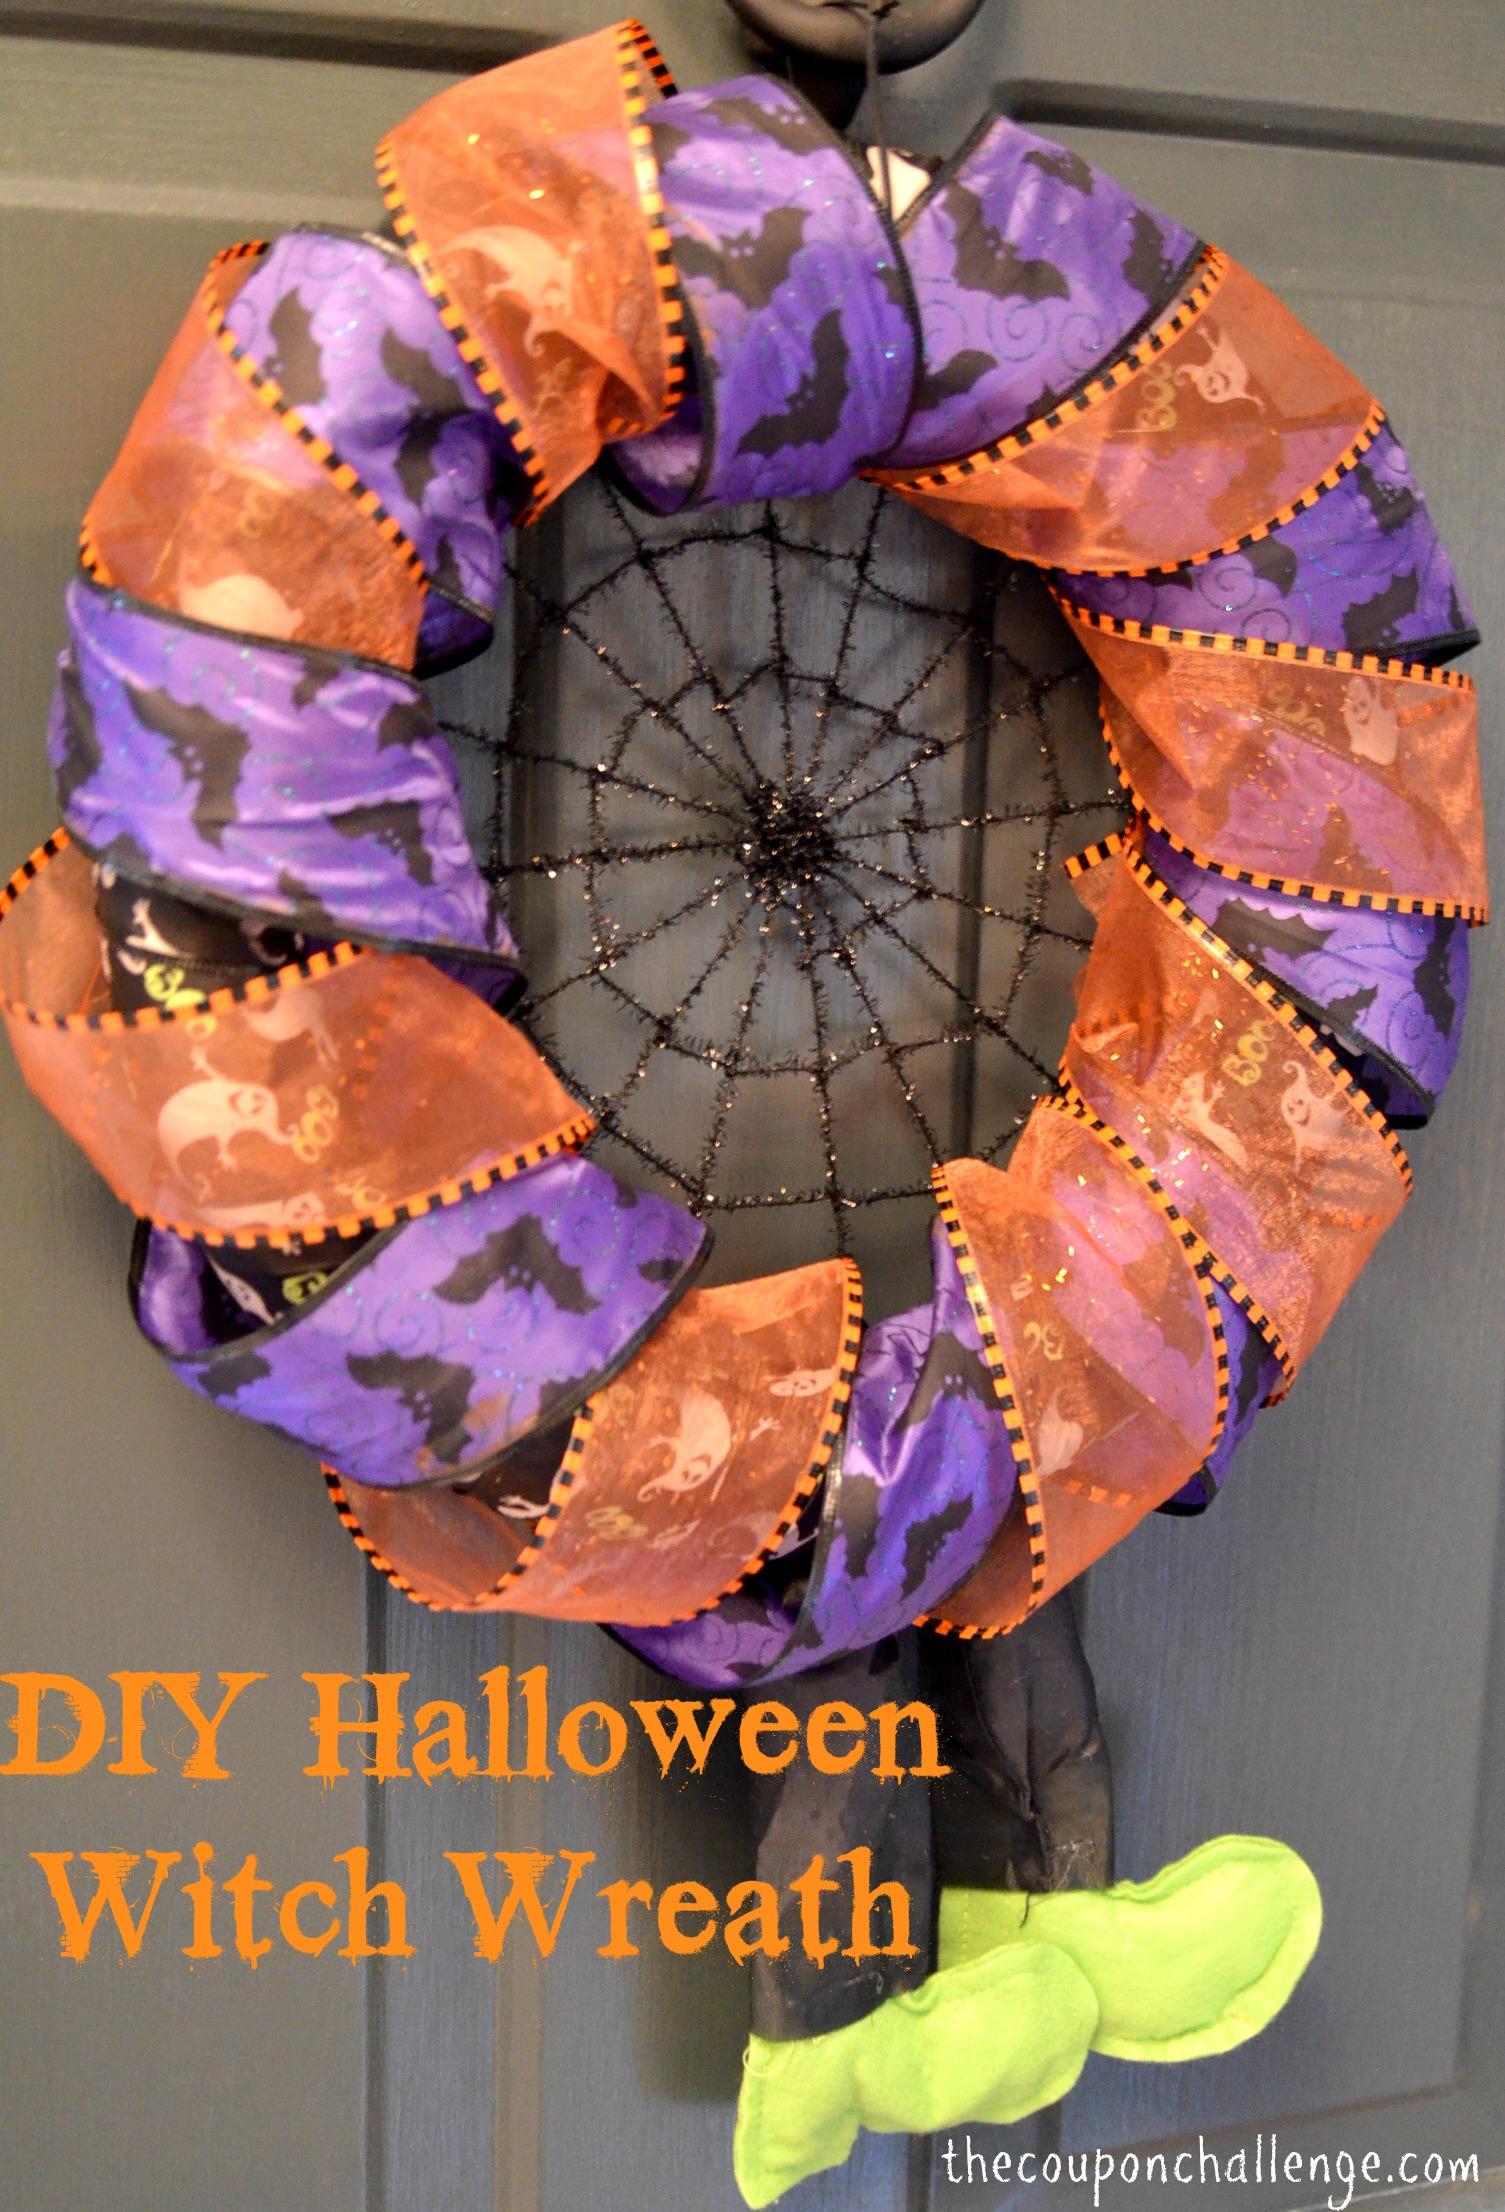 Diy halloween wreath - Halloween Witch Wreath